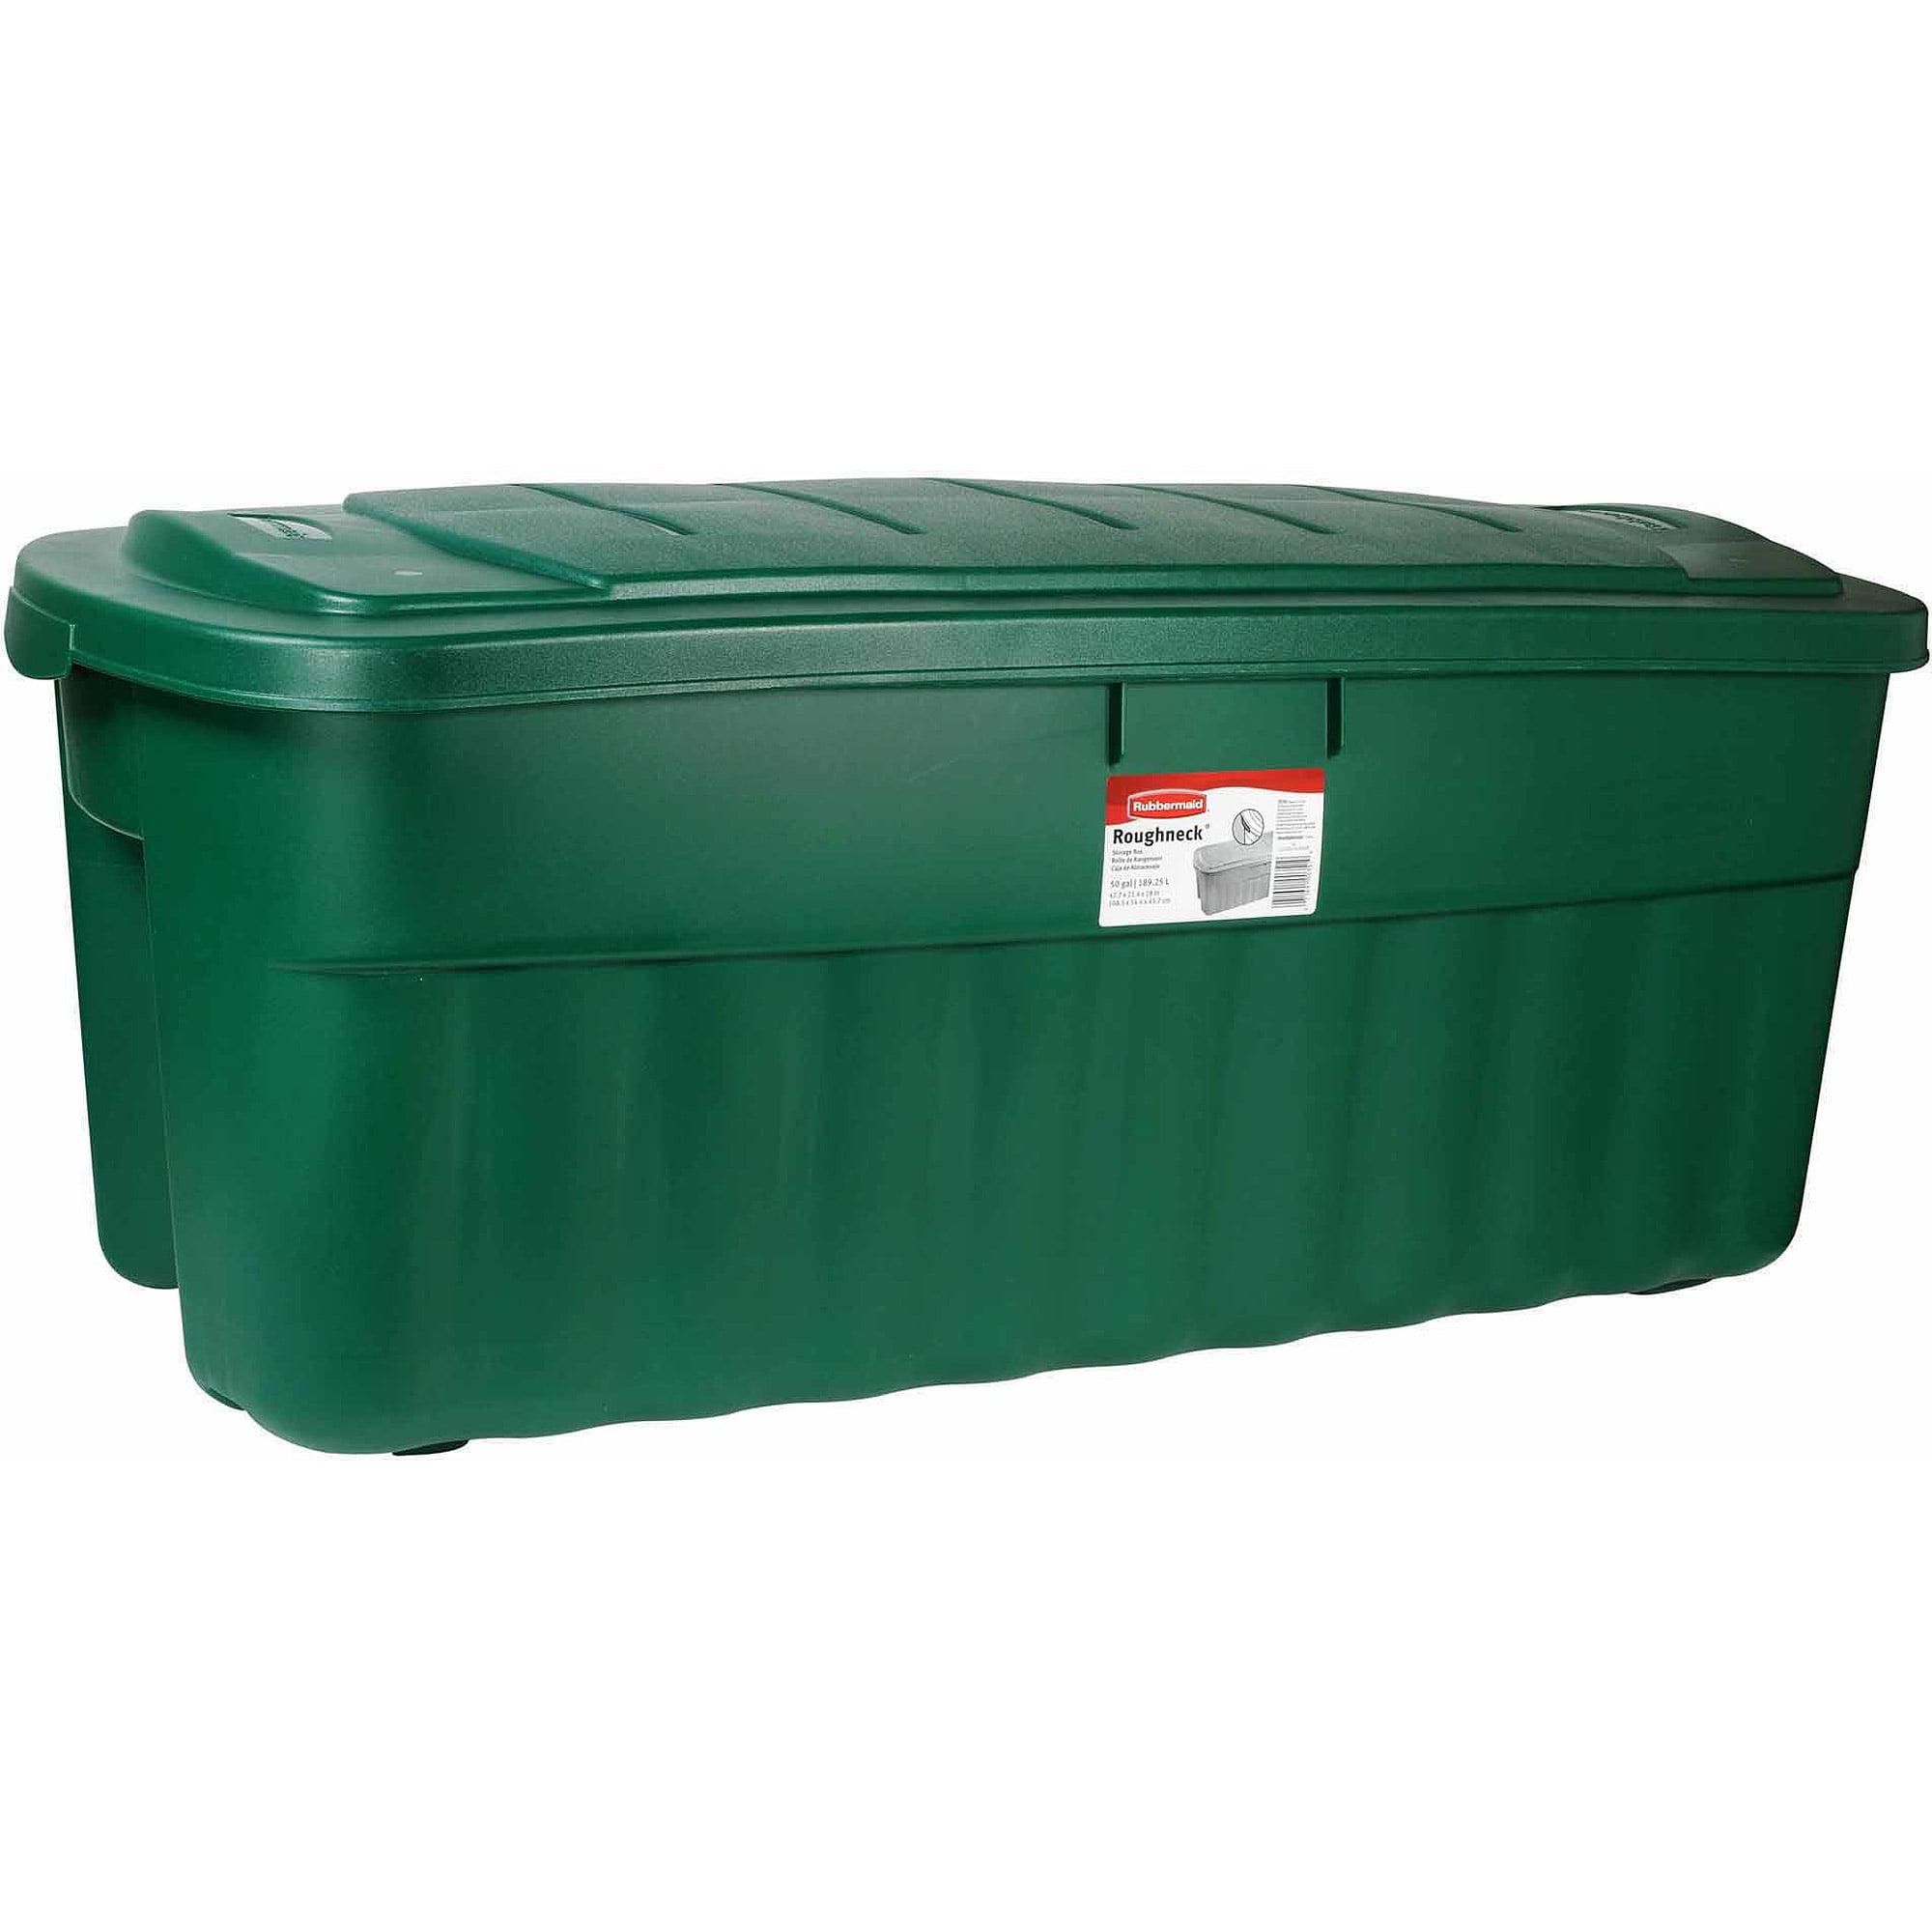 Rubbermaid Roughneck 50-Gallon Jumbo Storage Tote ...